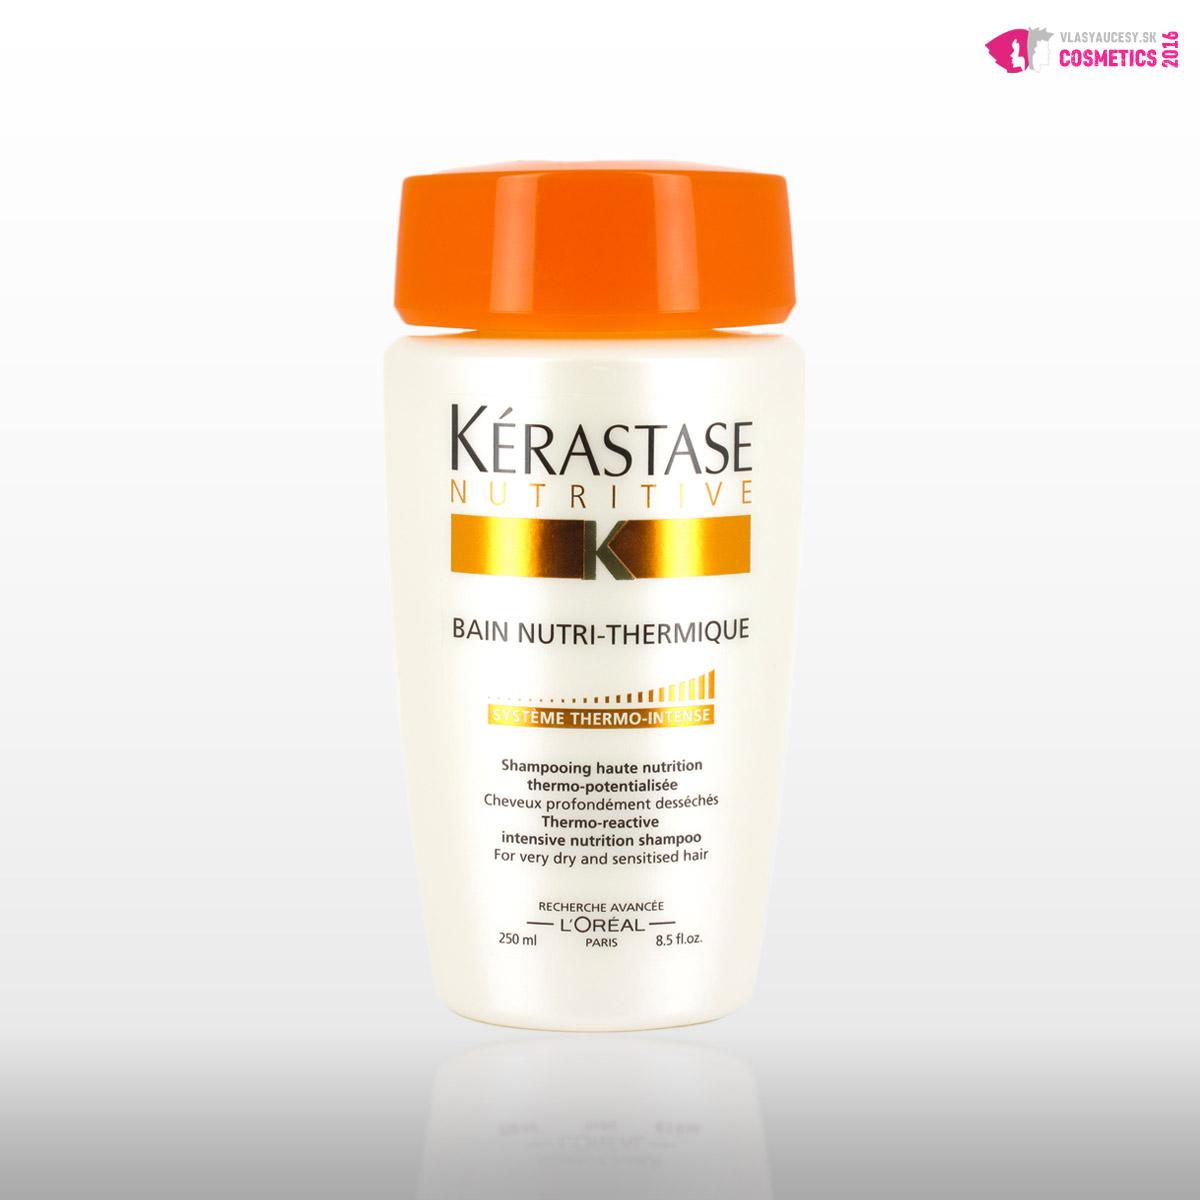 "Šampóny Kérastase pre suché vlasy: <a href=""http://www.anrdoezrs.net/links/8058143/type/dlg/http://www.parfums.sk/kerastase/nutritive-termoaktivny-sampon-pre-velmi-suche-a-citlive-vlasy/"" target=""_blank"">Kérastase Nutritive termoaktívny šampón pre veľmi suché a citlivé vlasy, cena od 16.90 €.</a>"